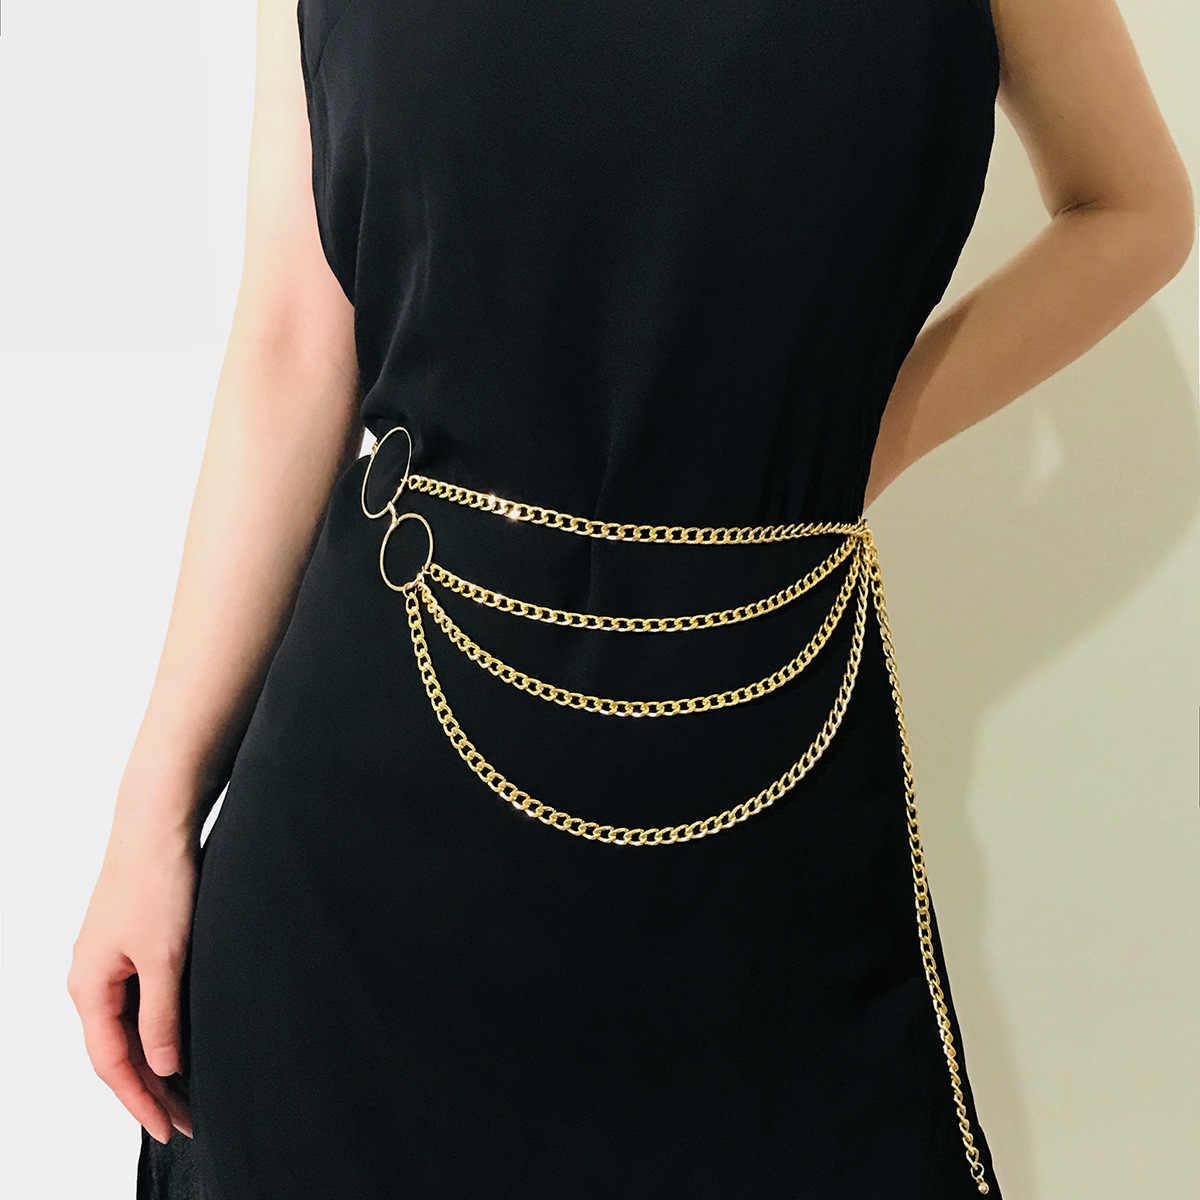 Fashion Women Belly Waist Chain Silver Gold Color Sexy Multi-layered Retro Tassels Waist Belt Chain Female Jewelry Accessories